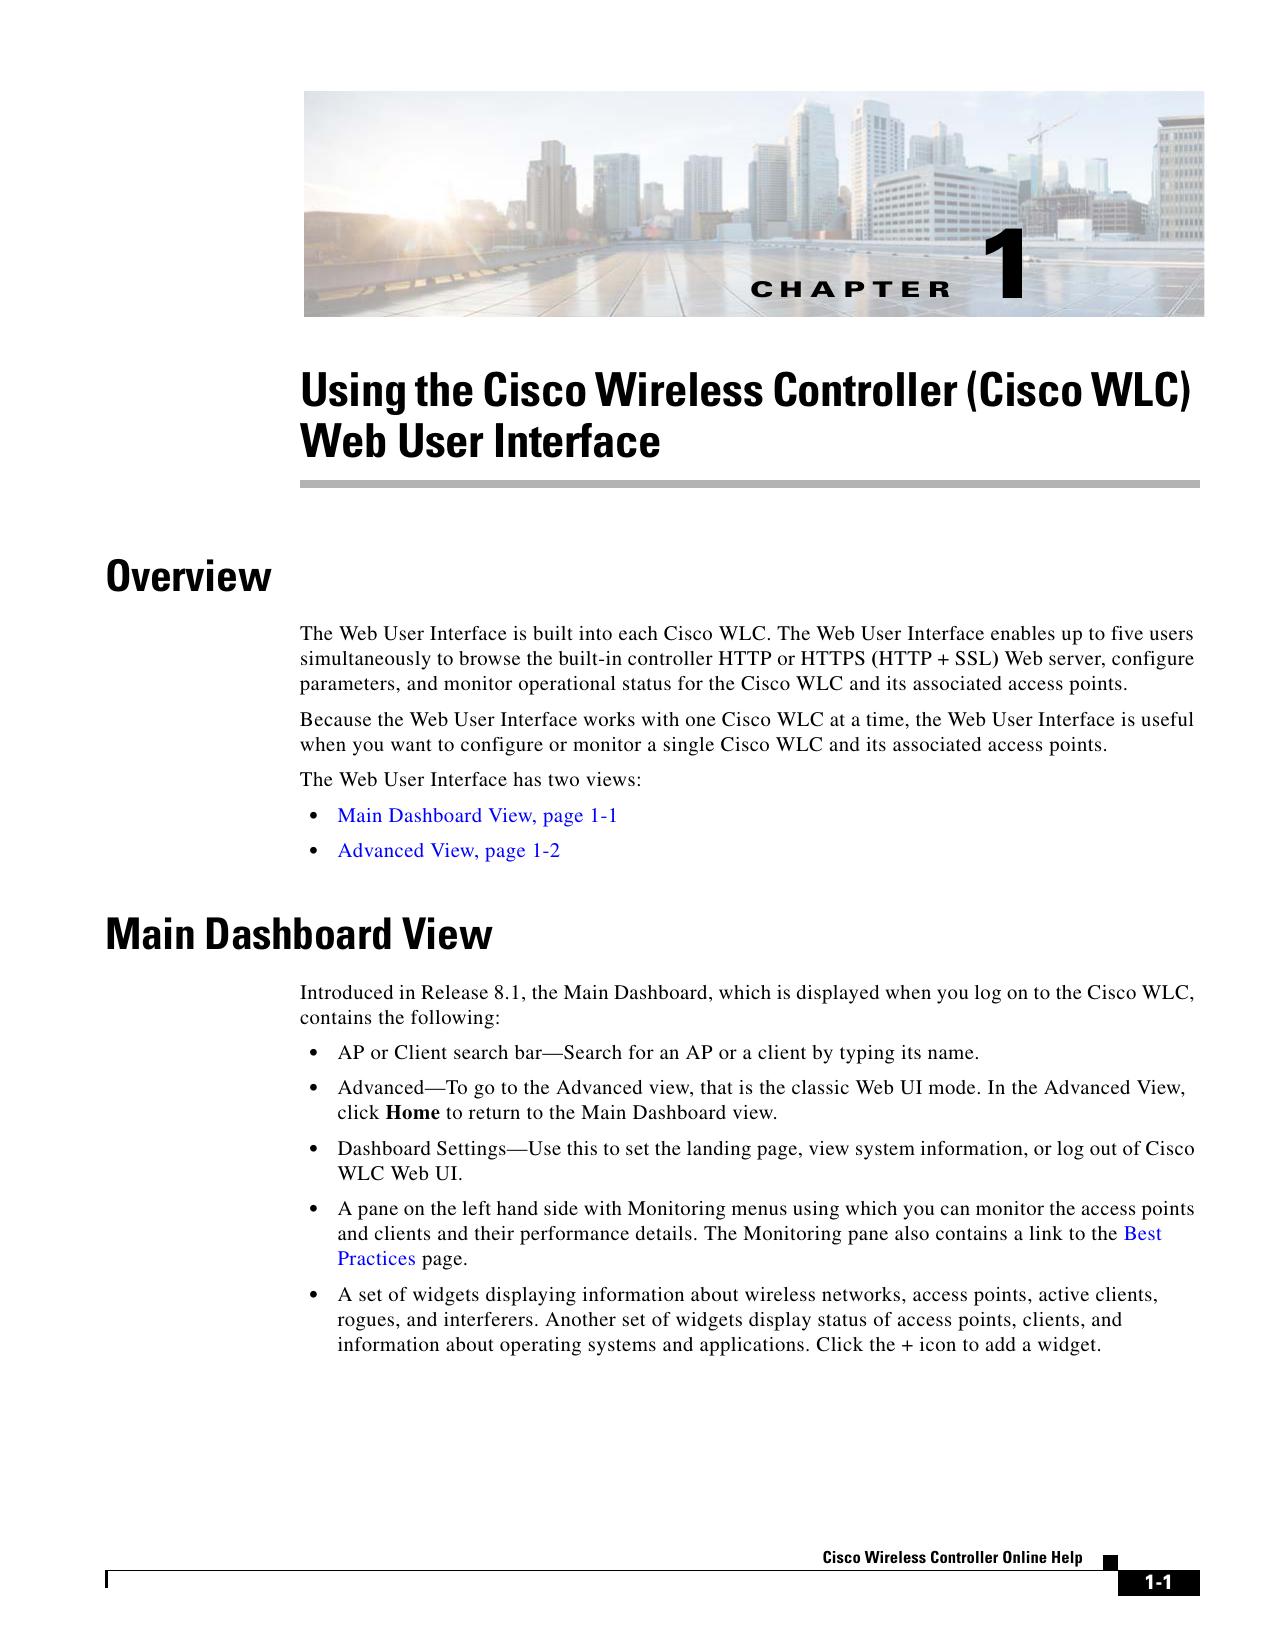 Cisco Wireless Controller Online Help, Release 8 1